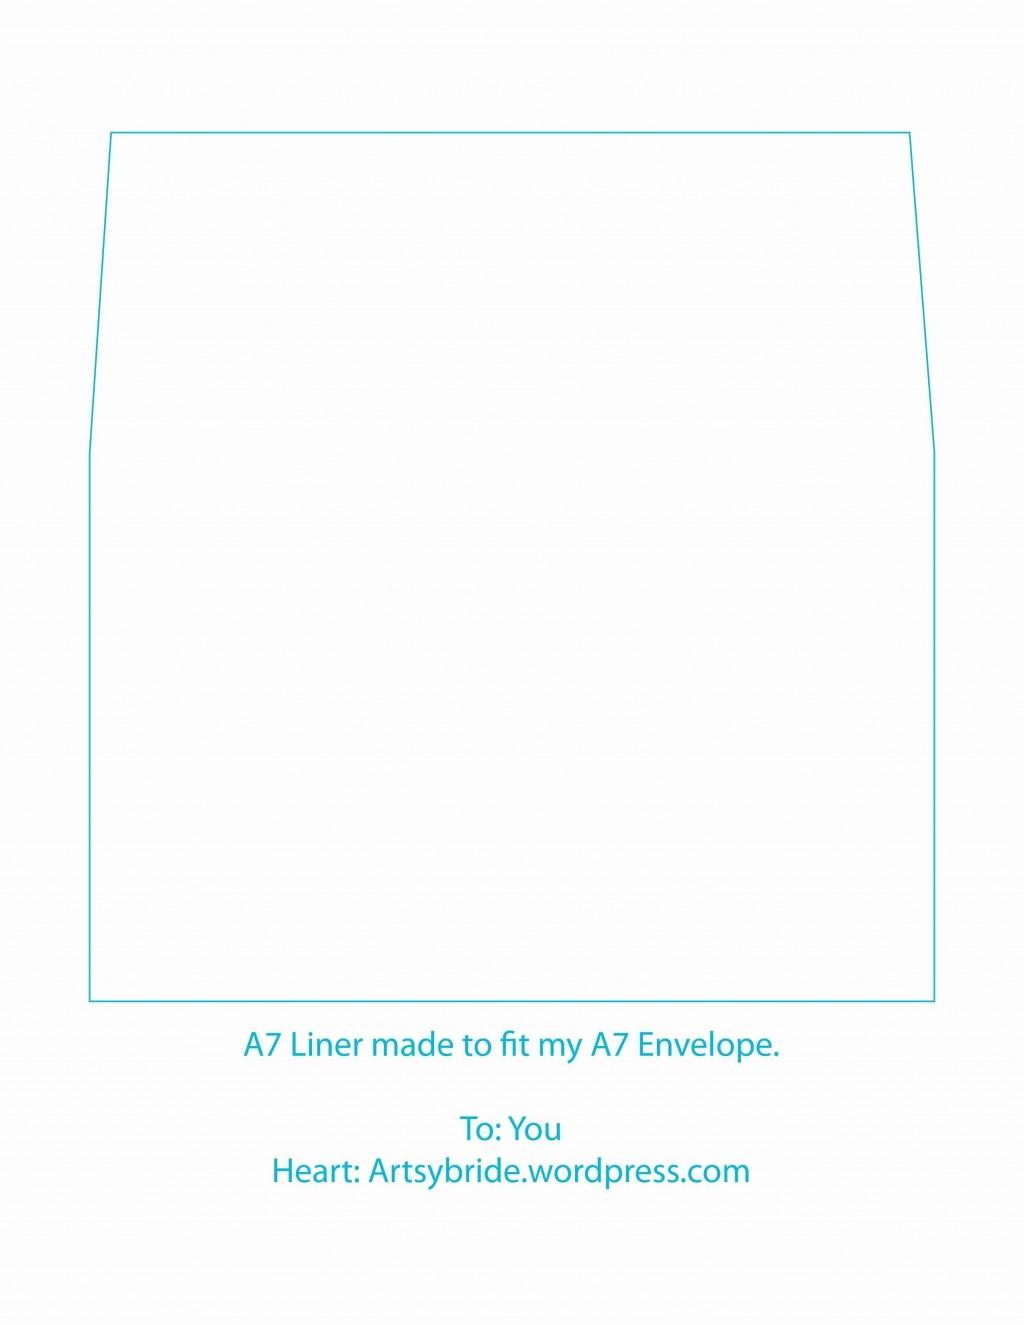 002 Awesome A7 Envelope Liner Template Idea  Printable Illustrator FreeLarge